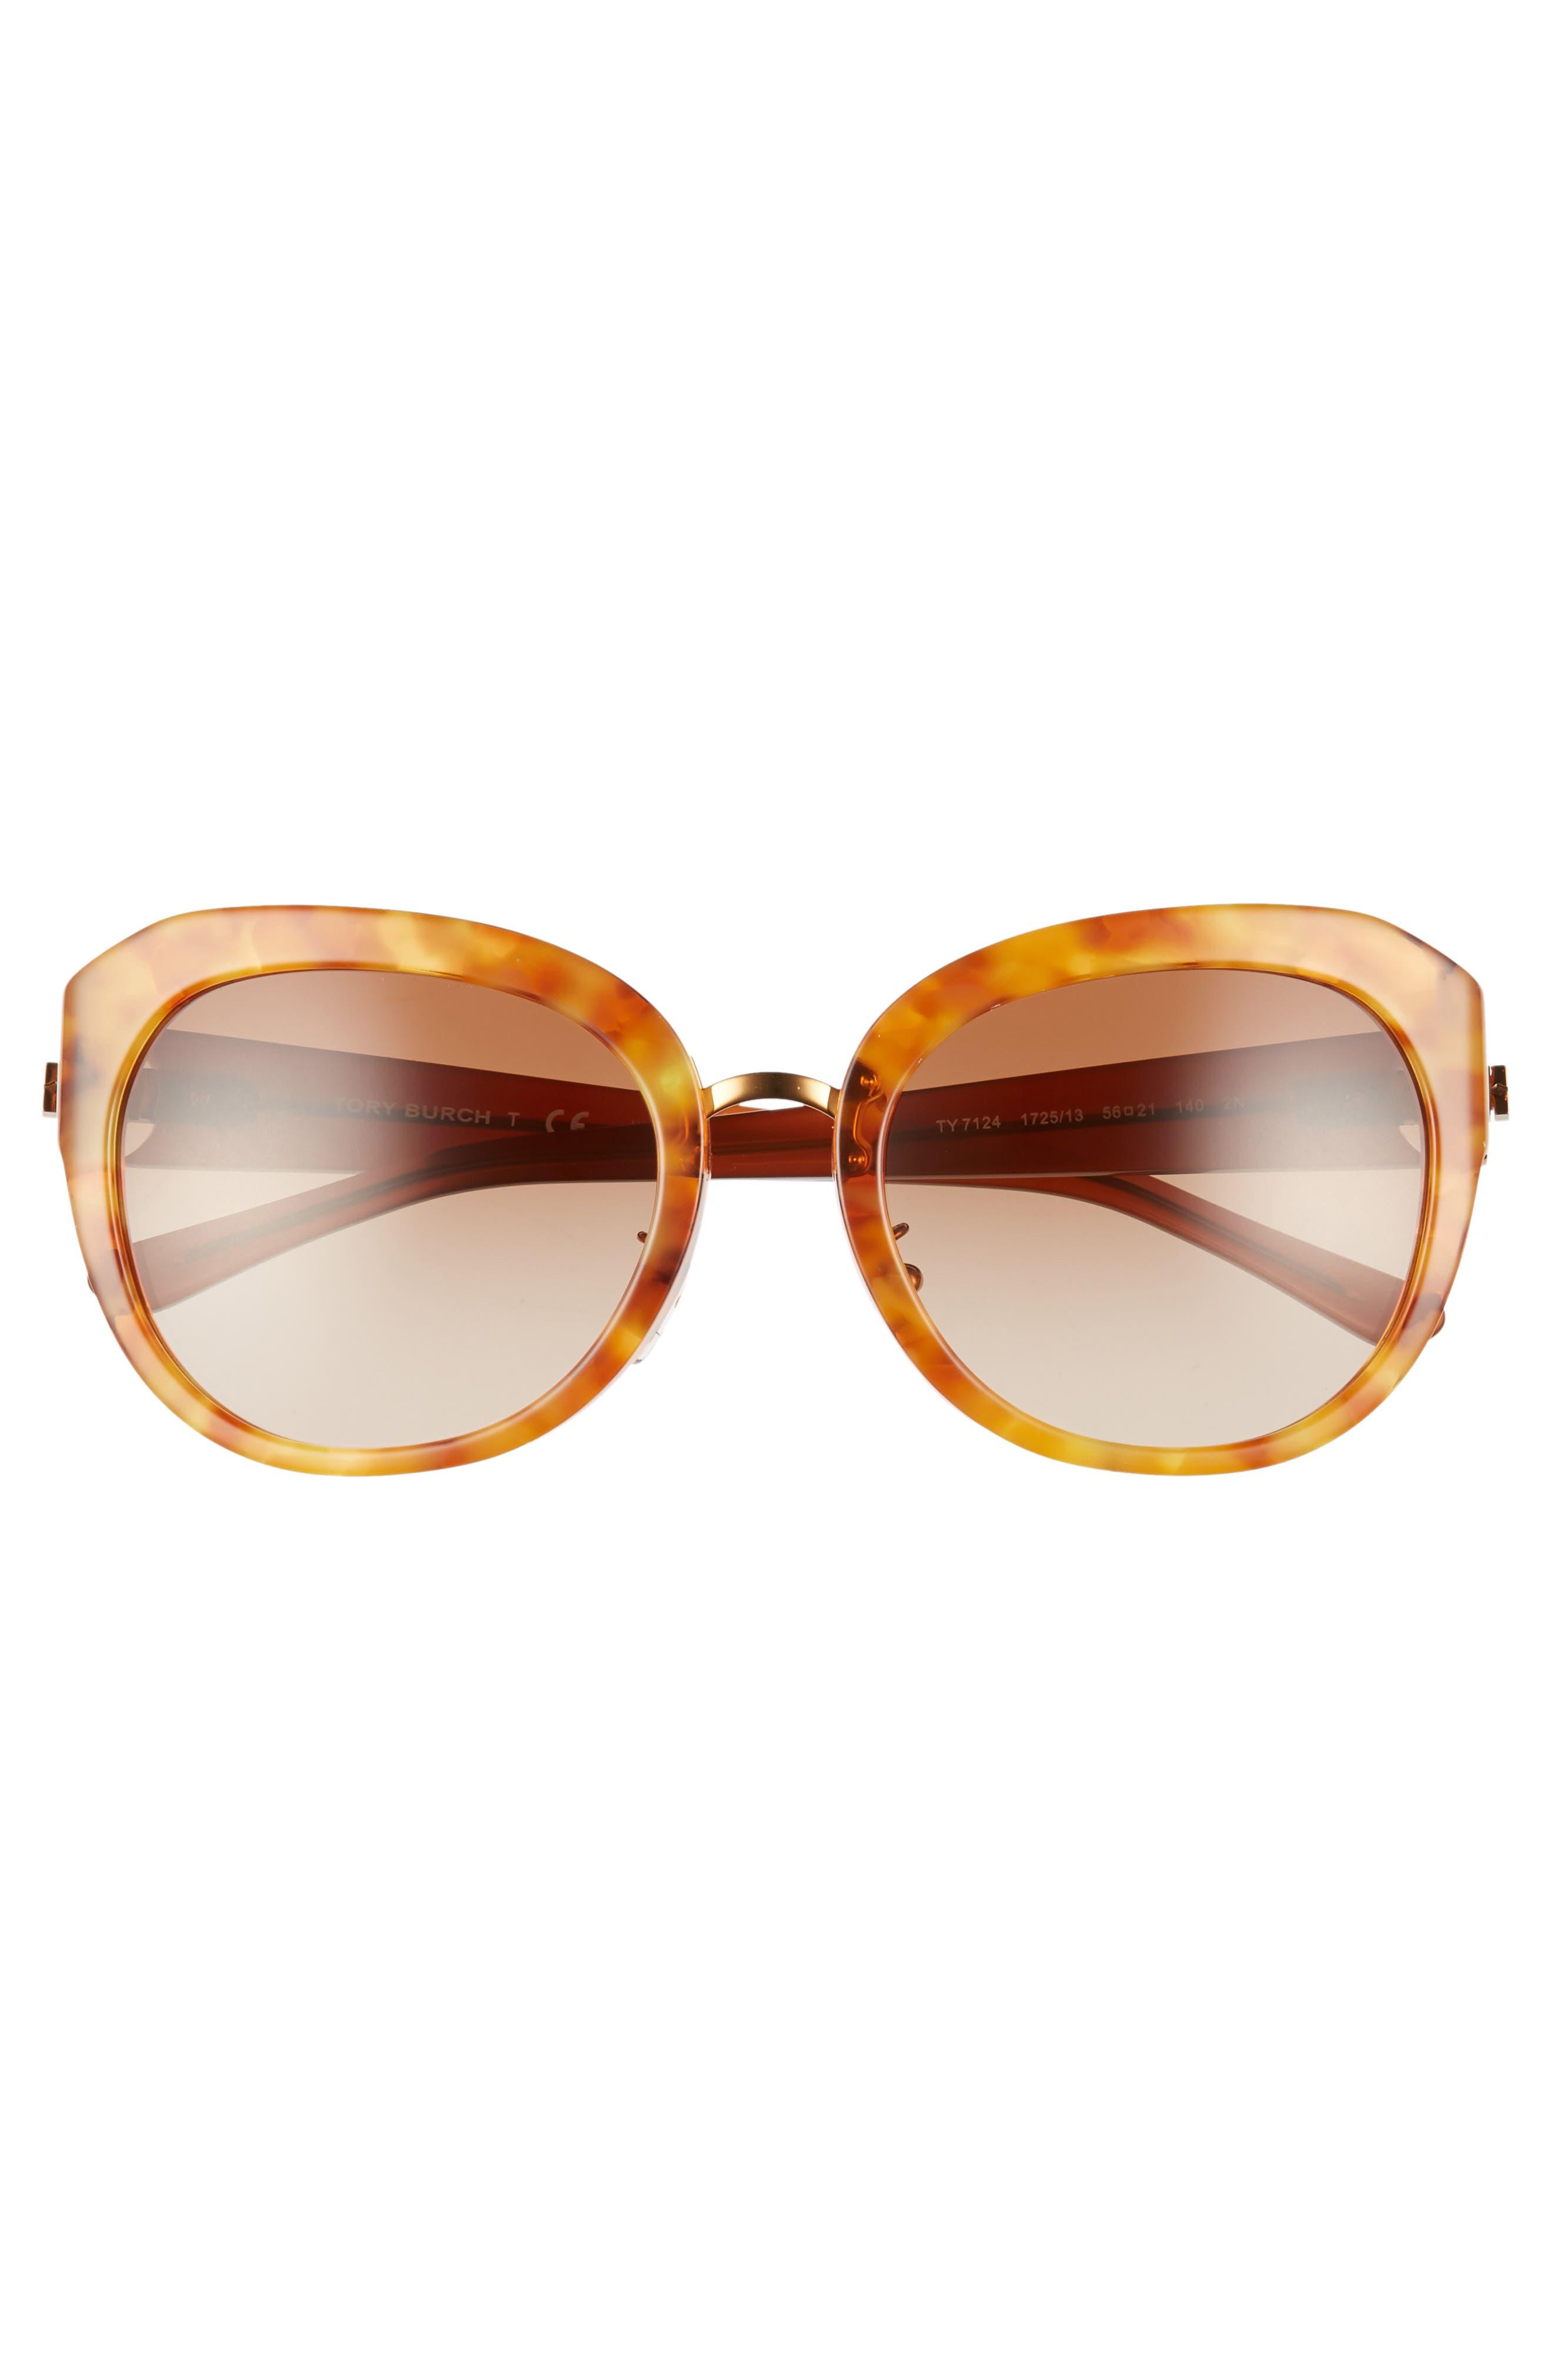 Irregular Reva 56mm Sunglasses,                             Alternate thumbnail 3, color,                             AMBER GRADIENT